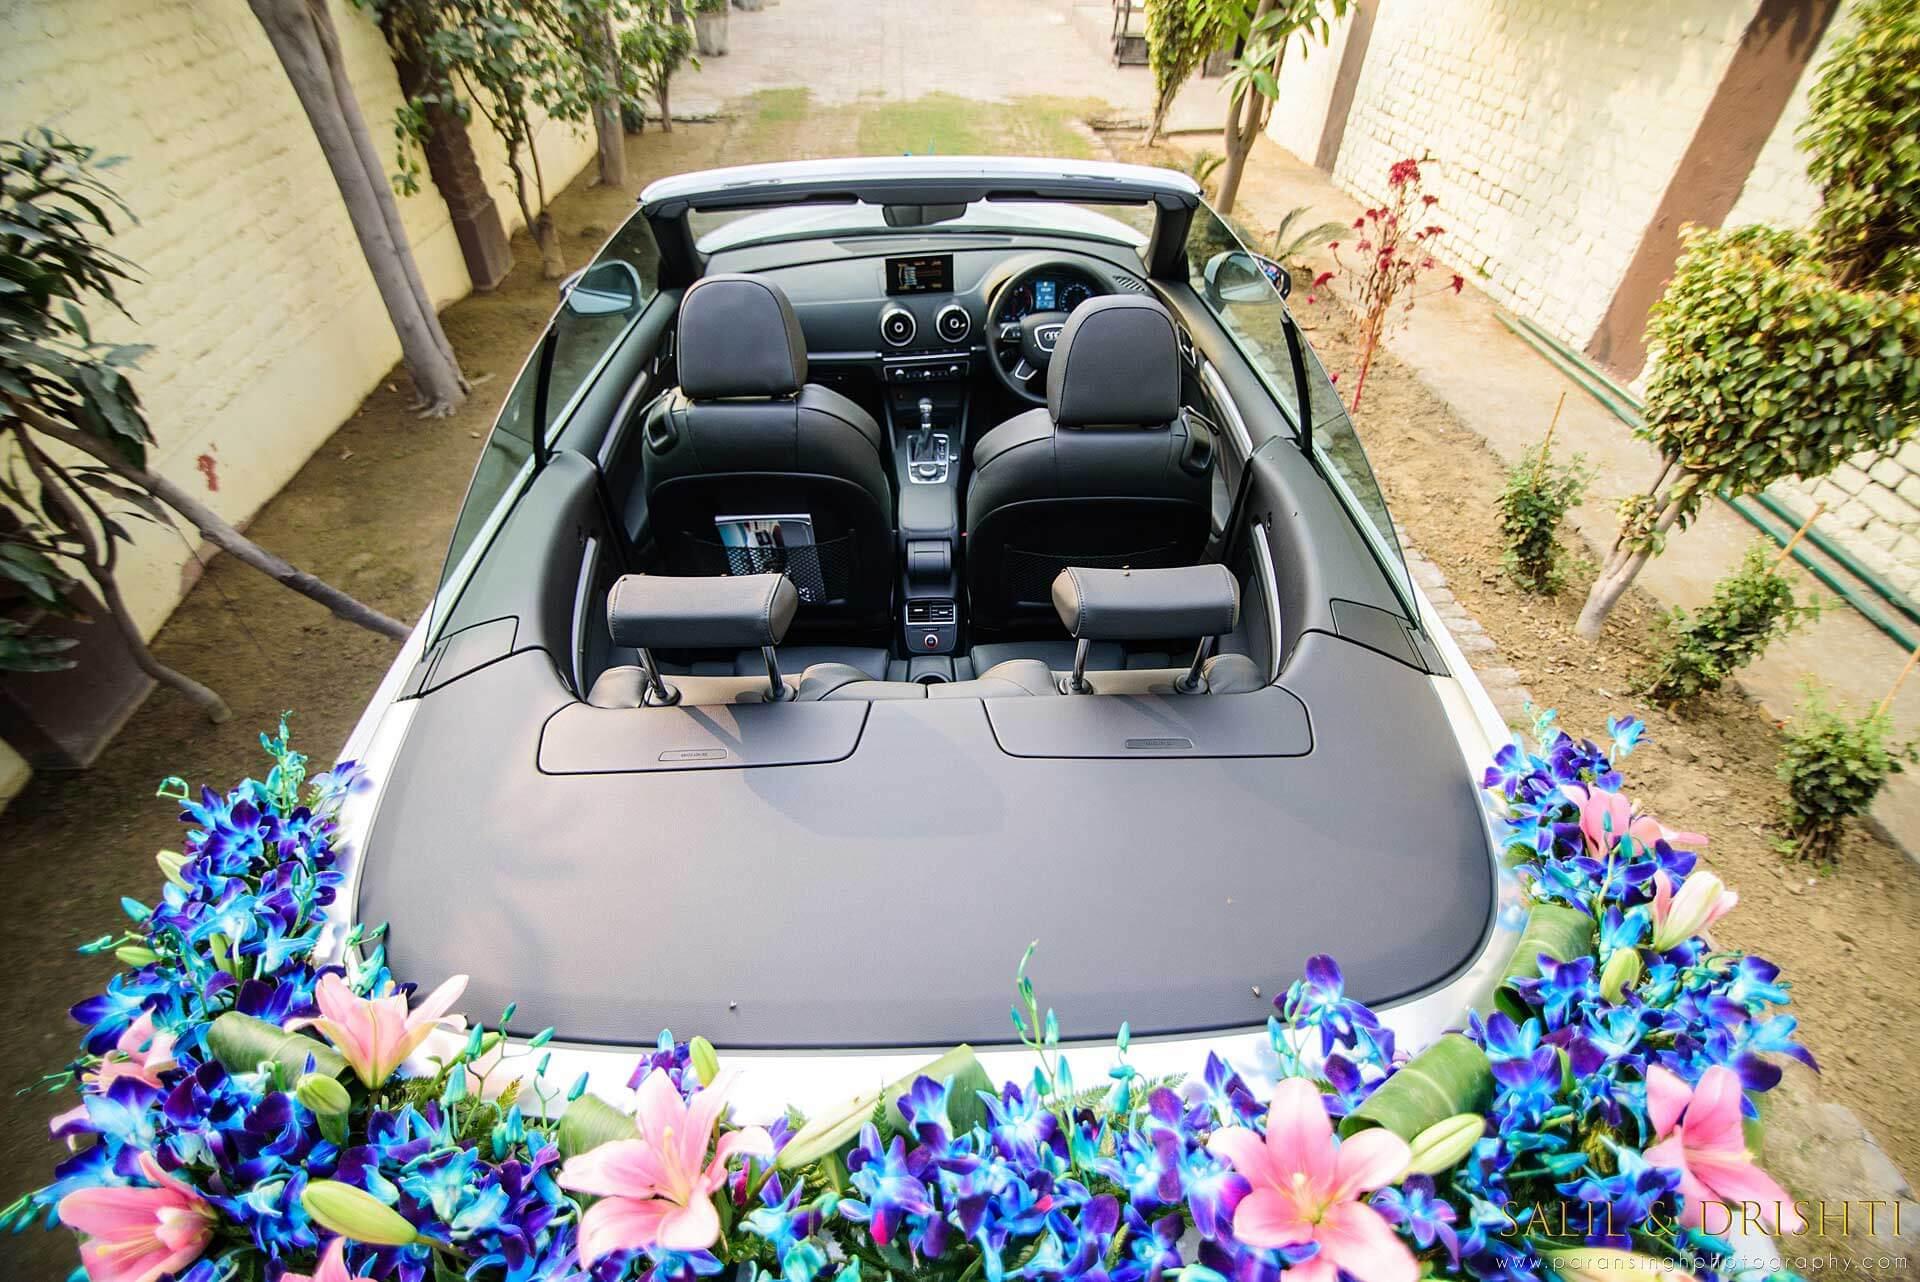 orchid decor for wedding car